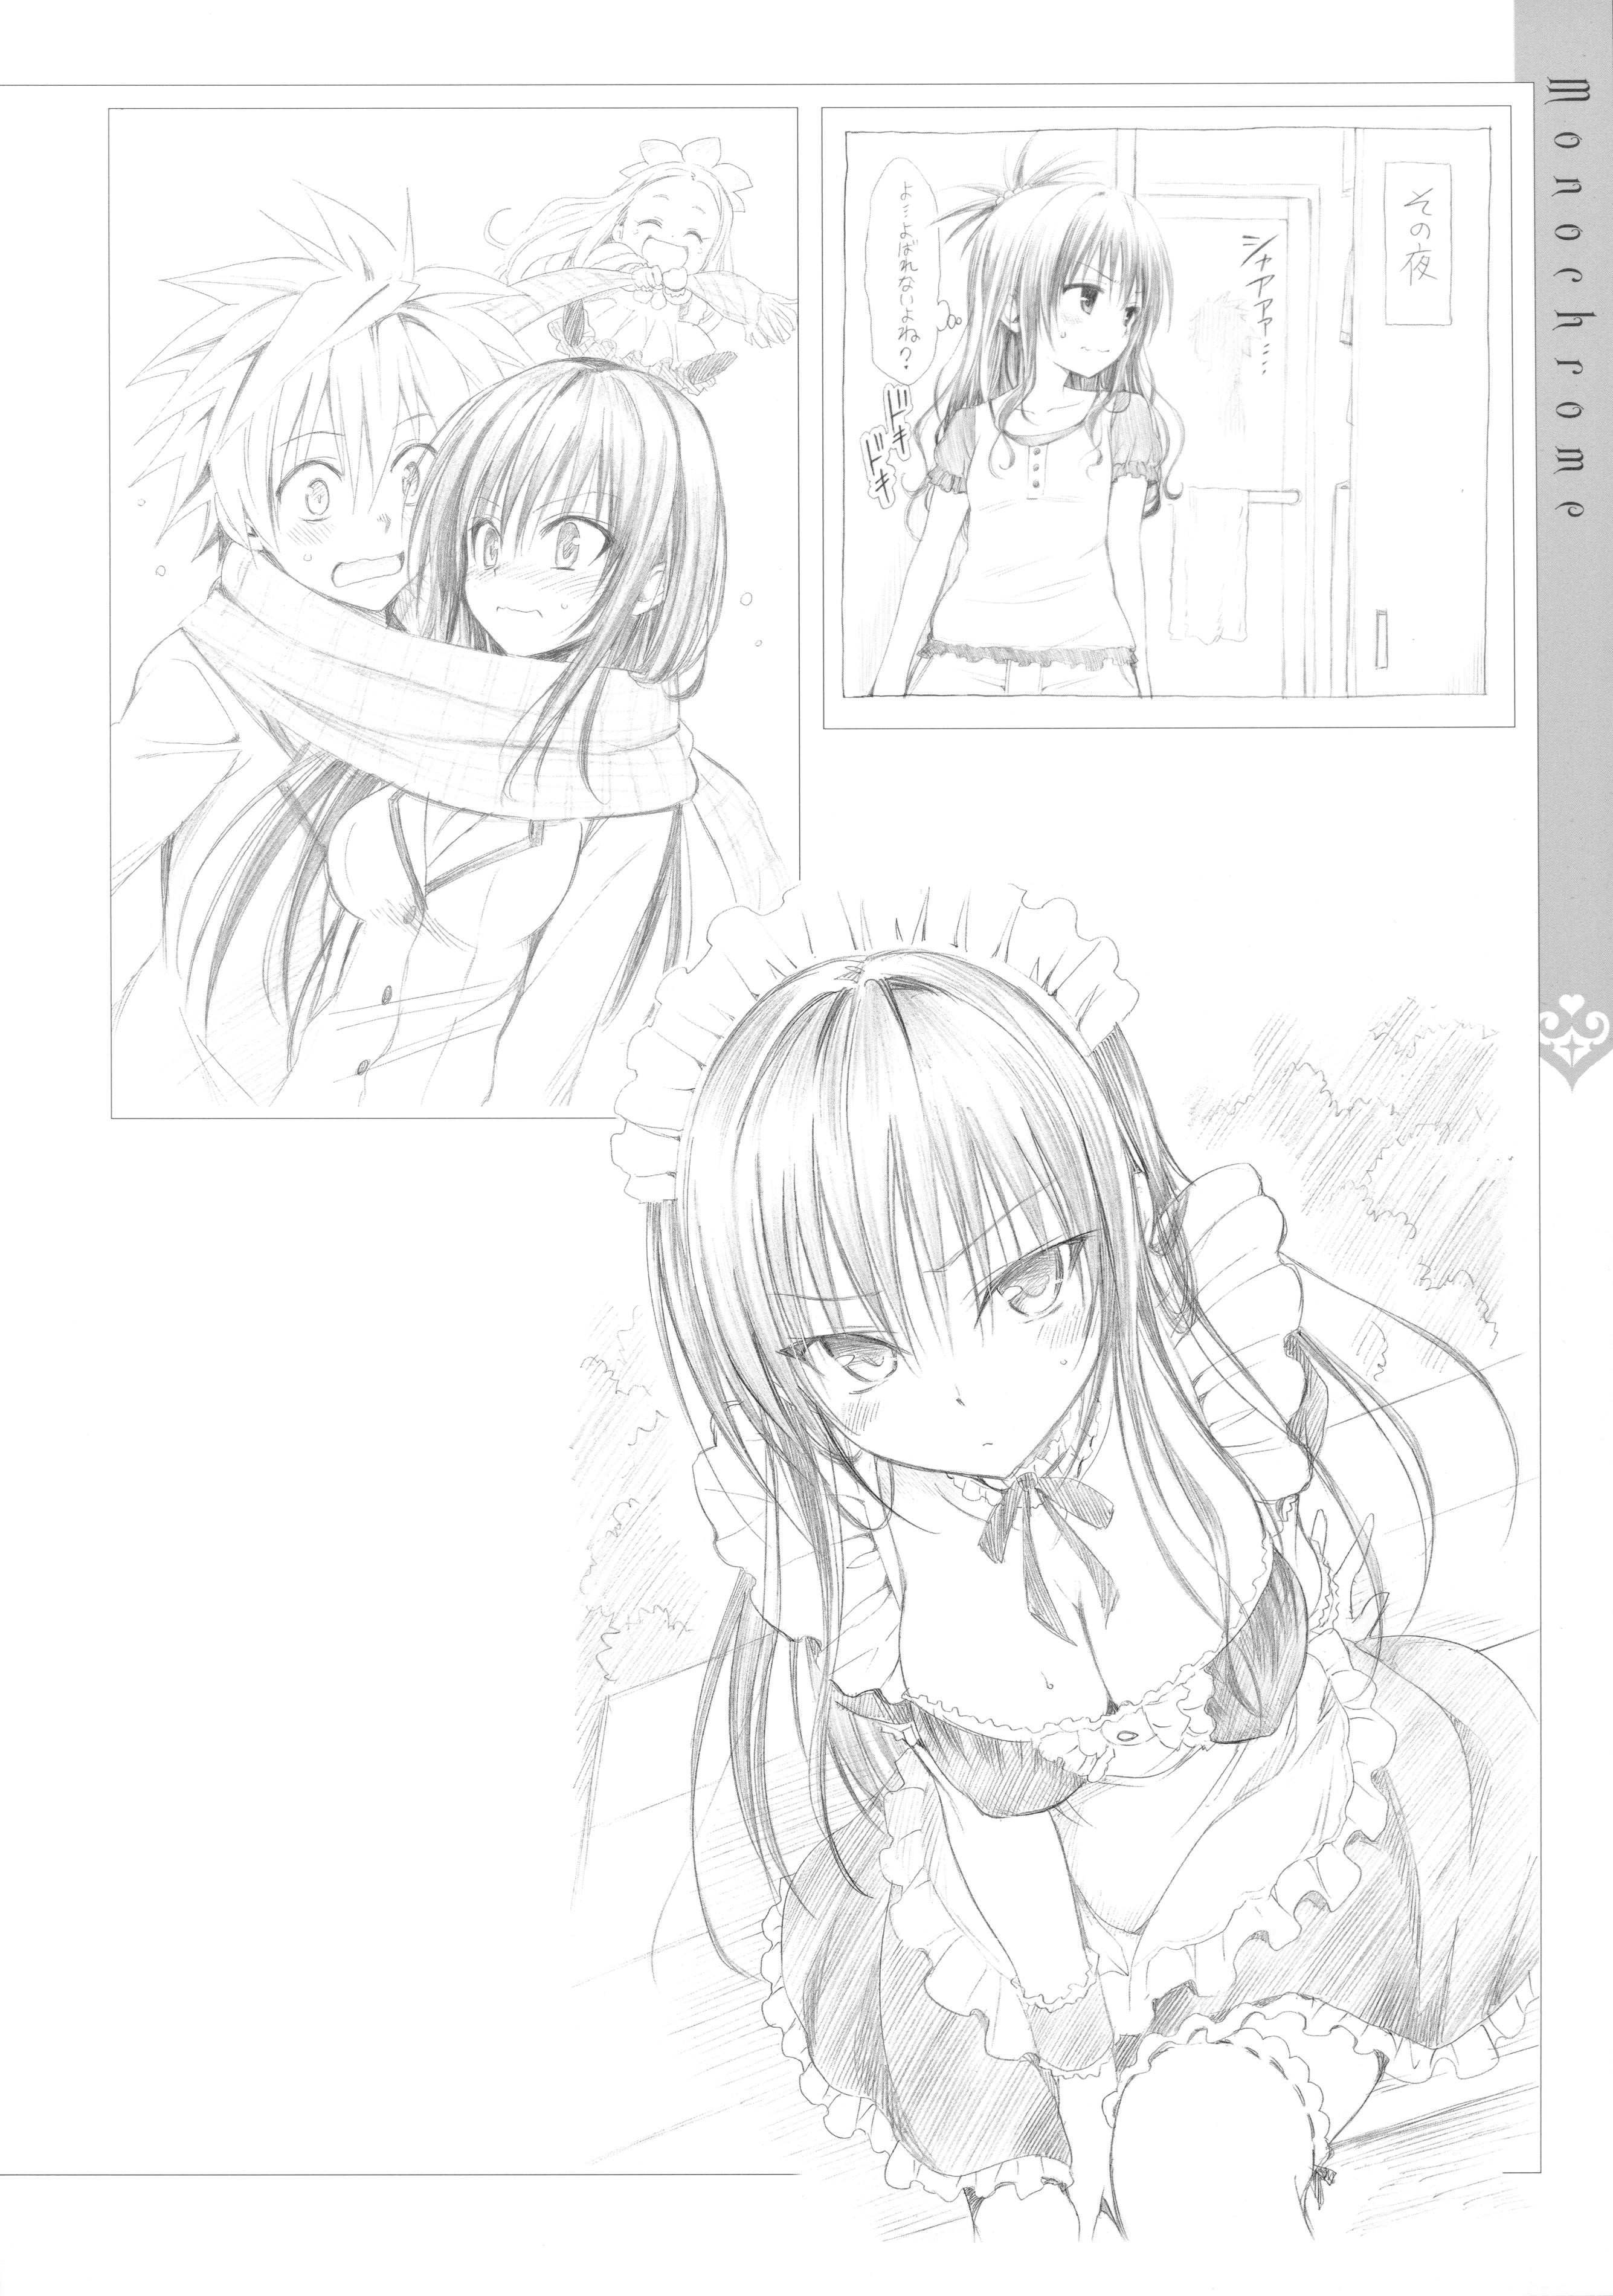 [Yabuki Kentaro] To Love-Ru -Trouble- Darkness Artbook Harem Gold 124